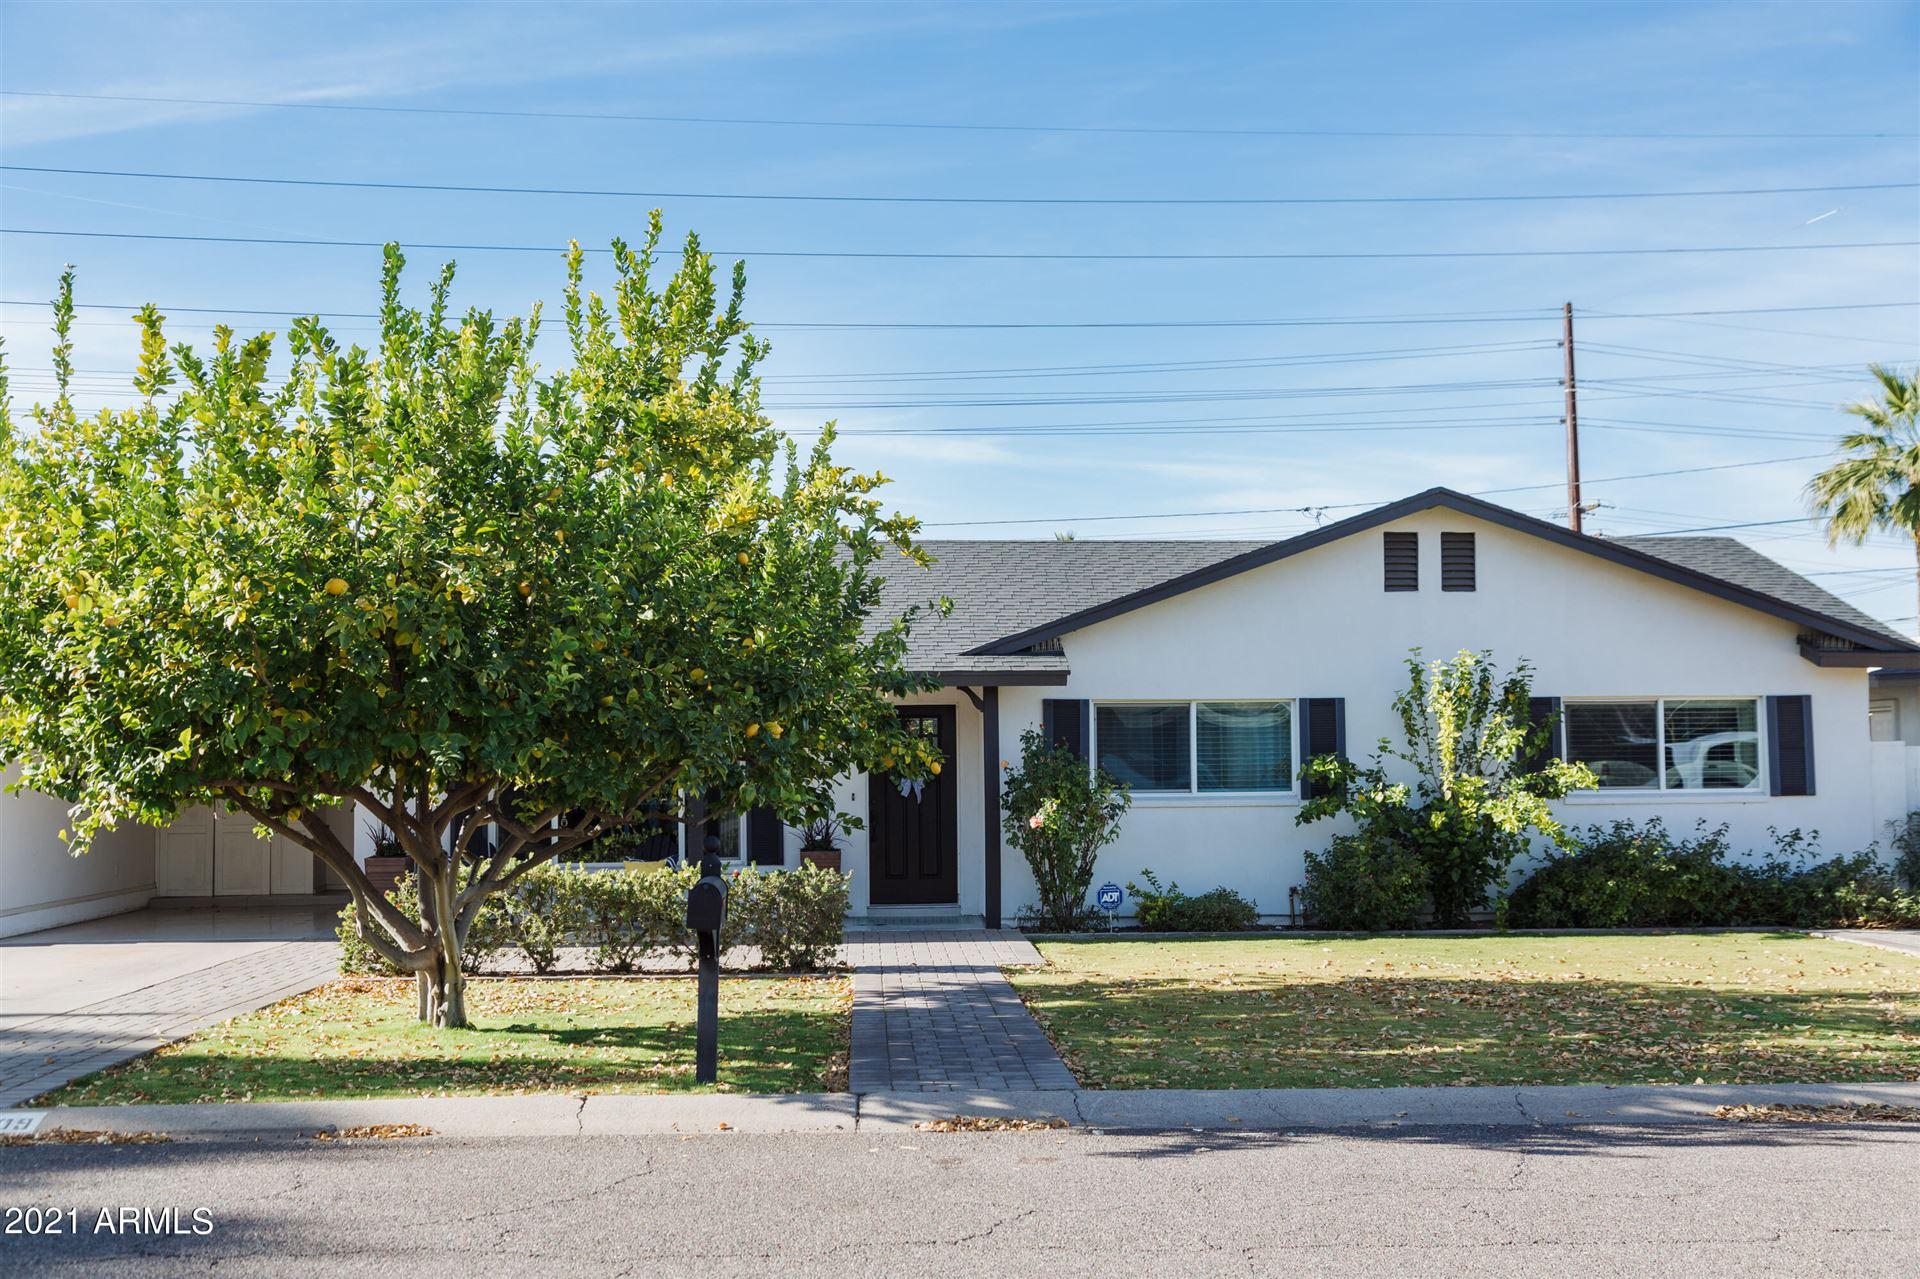 4309 E CALLE REDONDA --, Phoenix, AZ 85018 - MLS#: 6304141